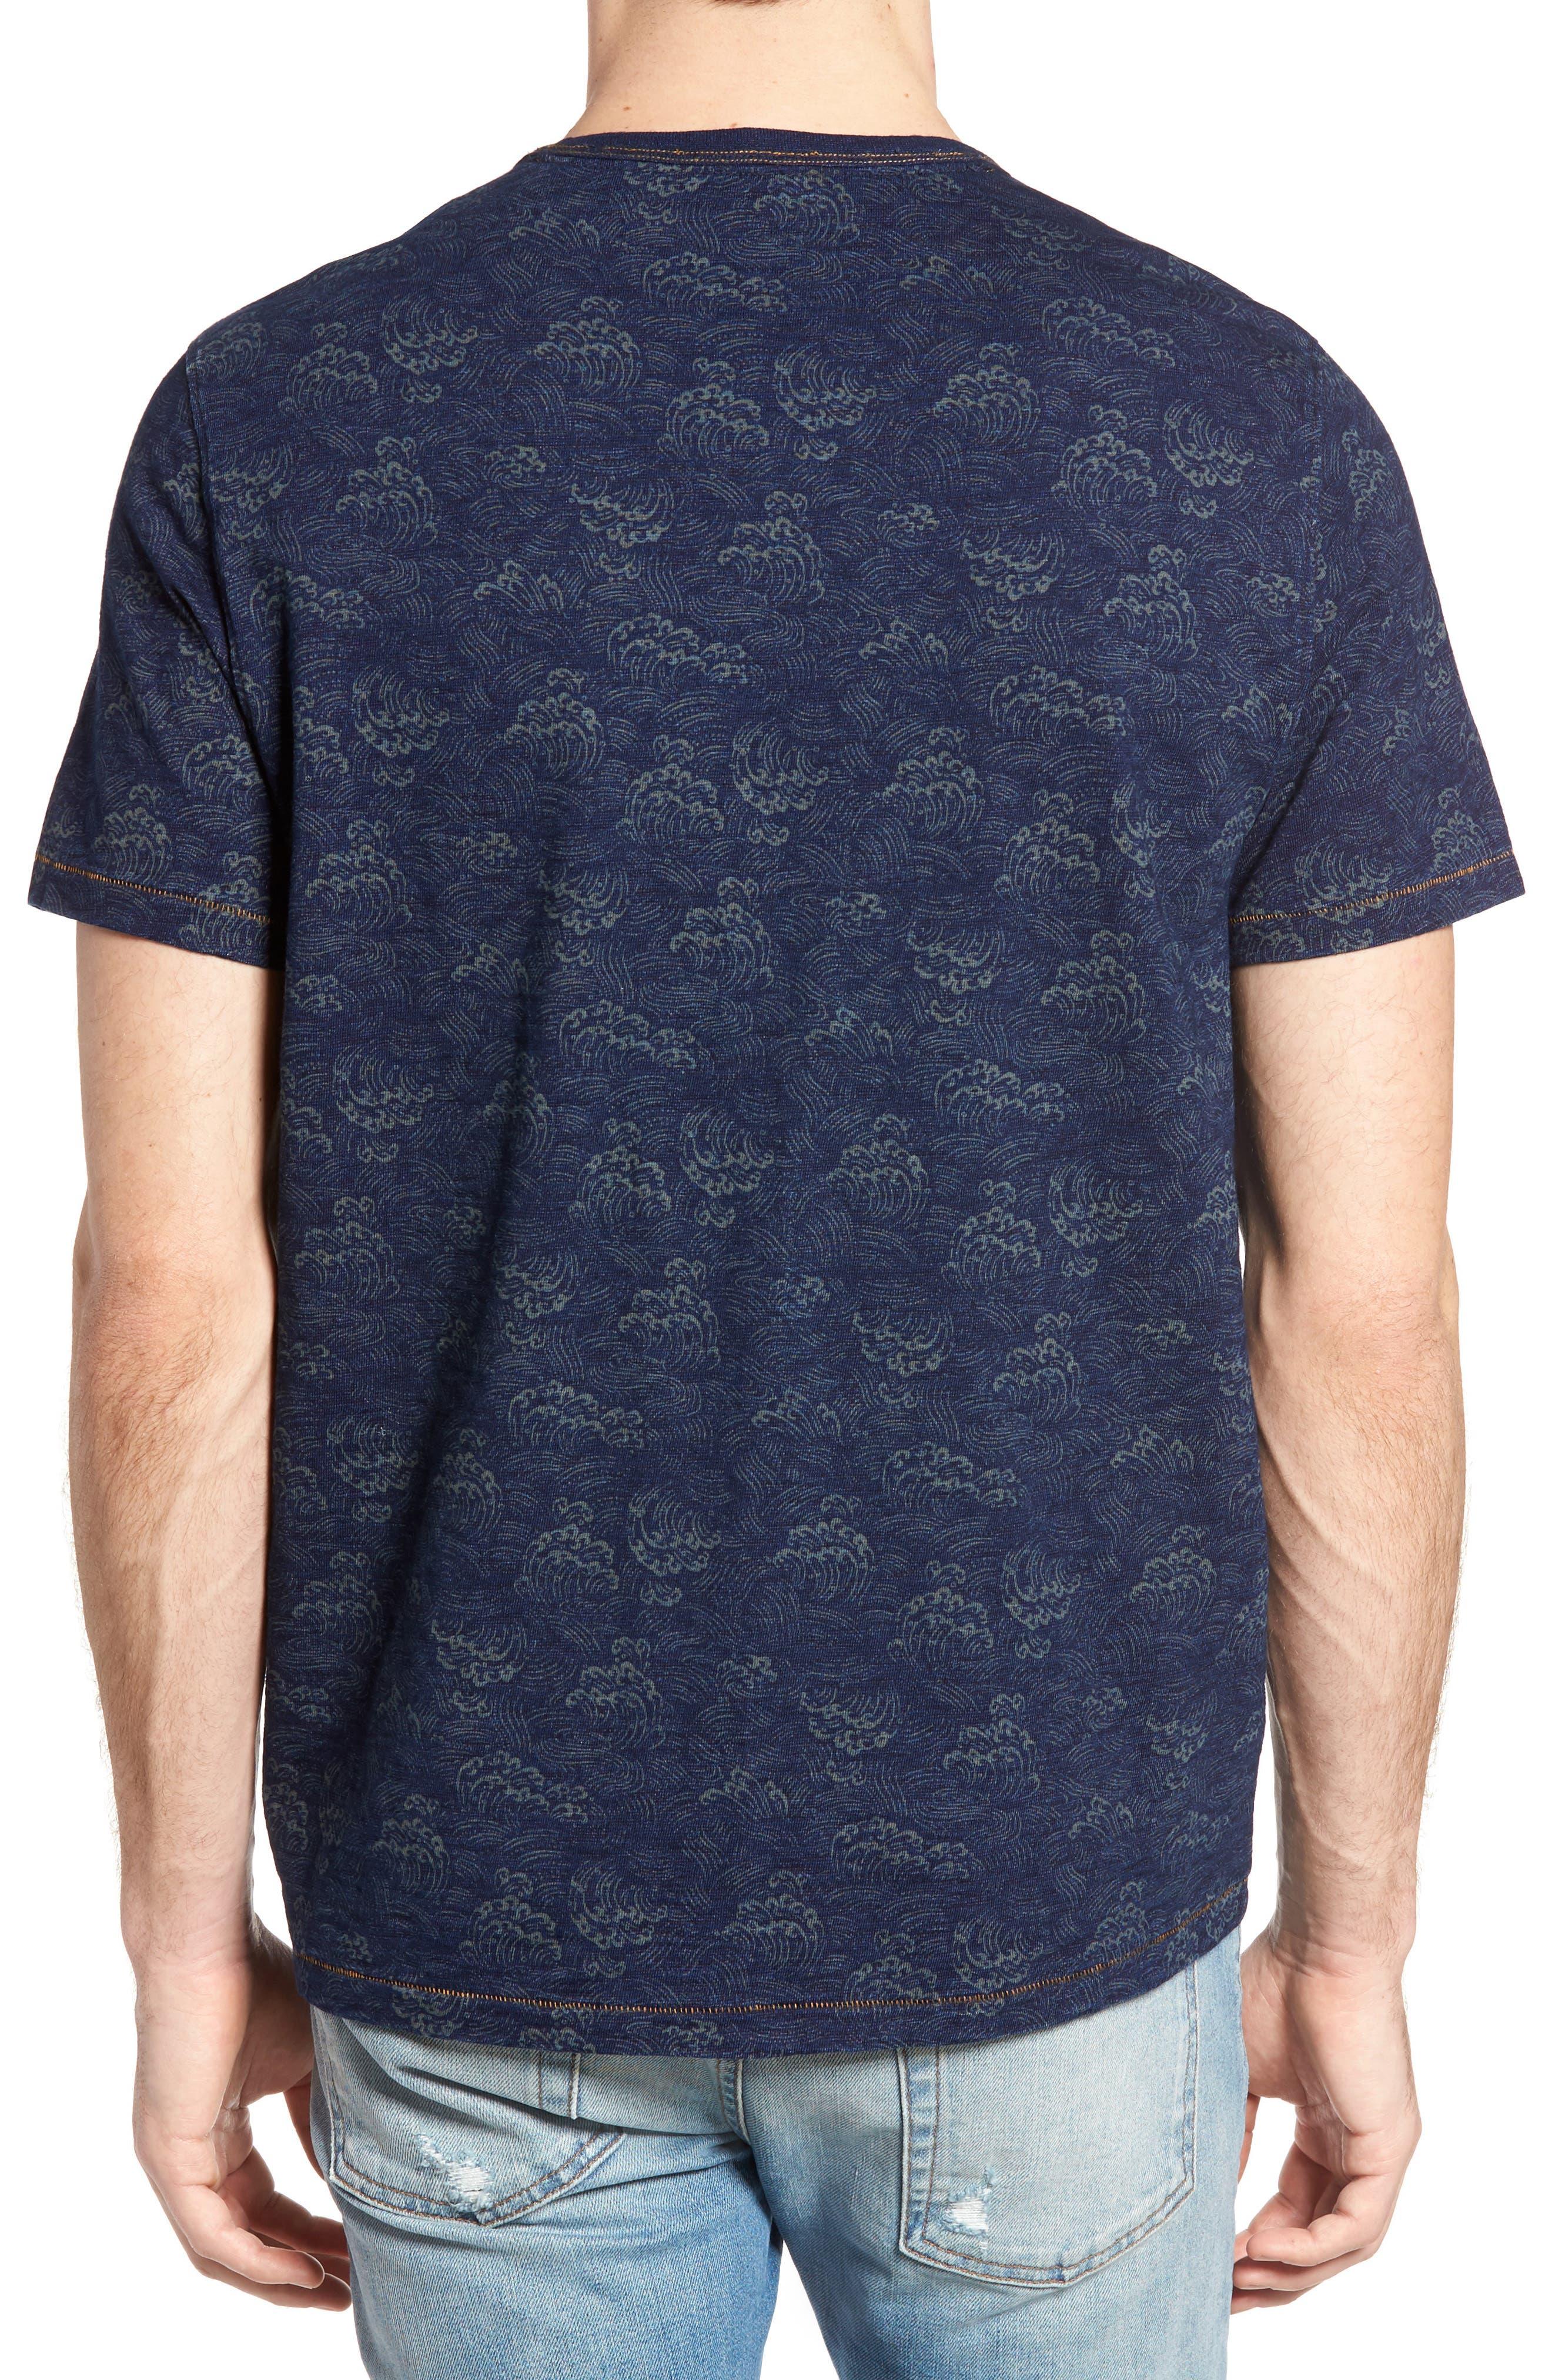 Swell Print Indigo Slub Jersey T-Shirt,                             Alternate thumbnail 2, color,